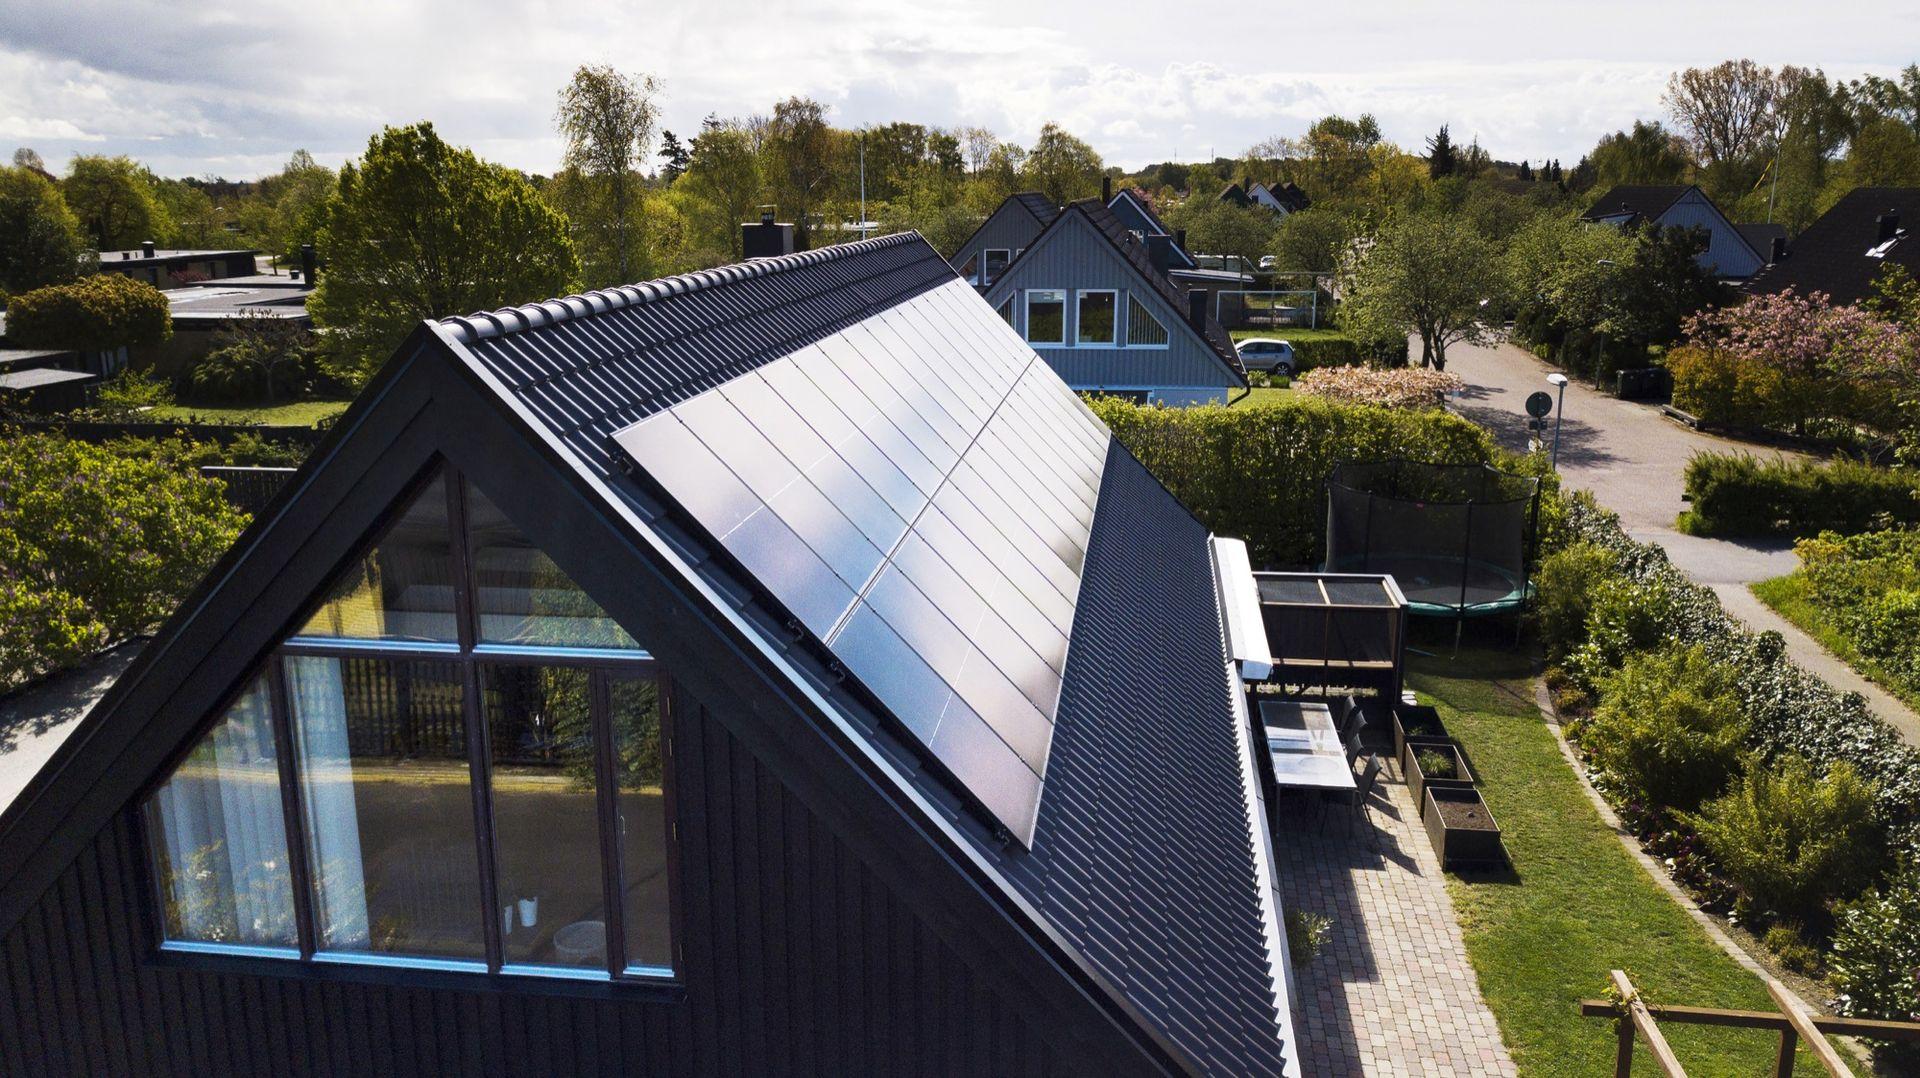 Nu börjar IKEA sälja solcellspaneler i Sverige